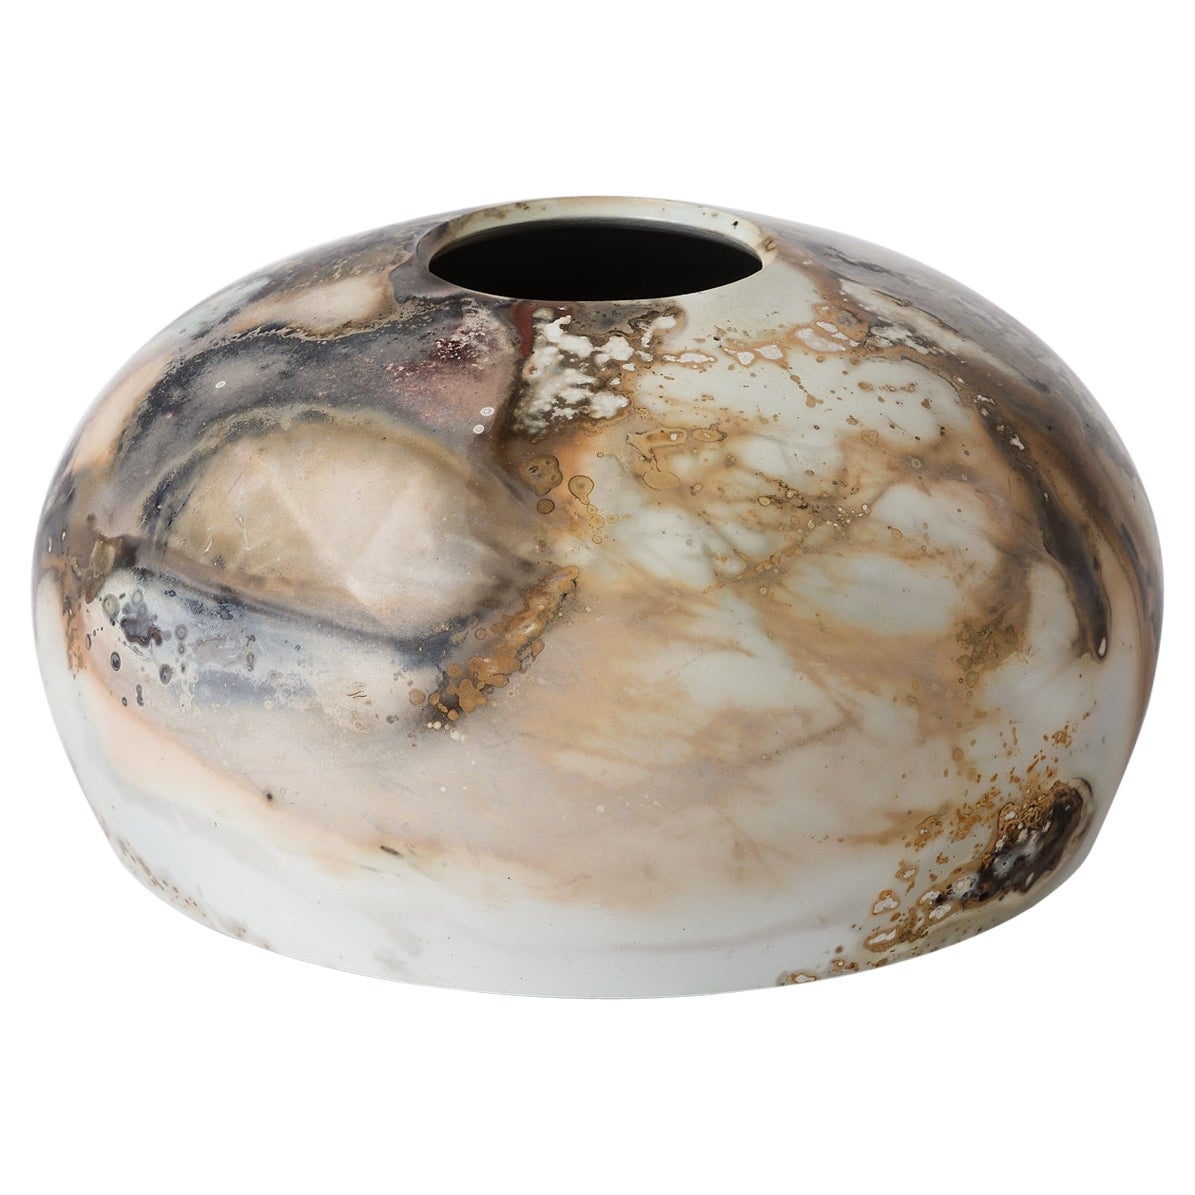 Ceramic Vase by Alistair Dahnieux, circa 2010